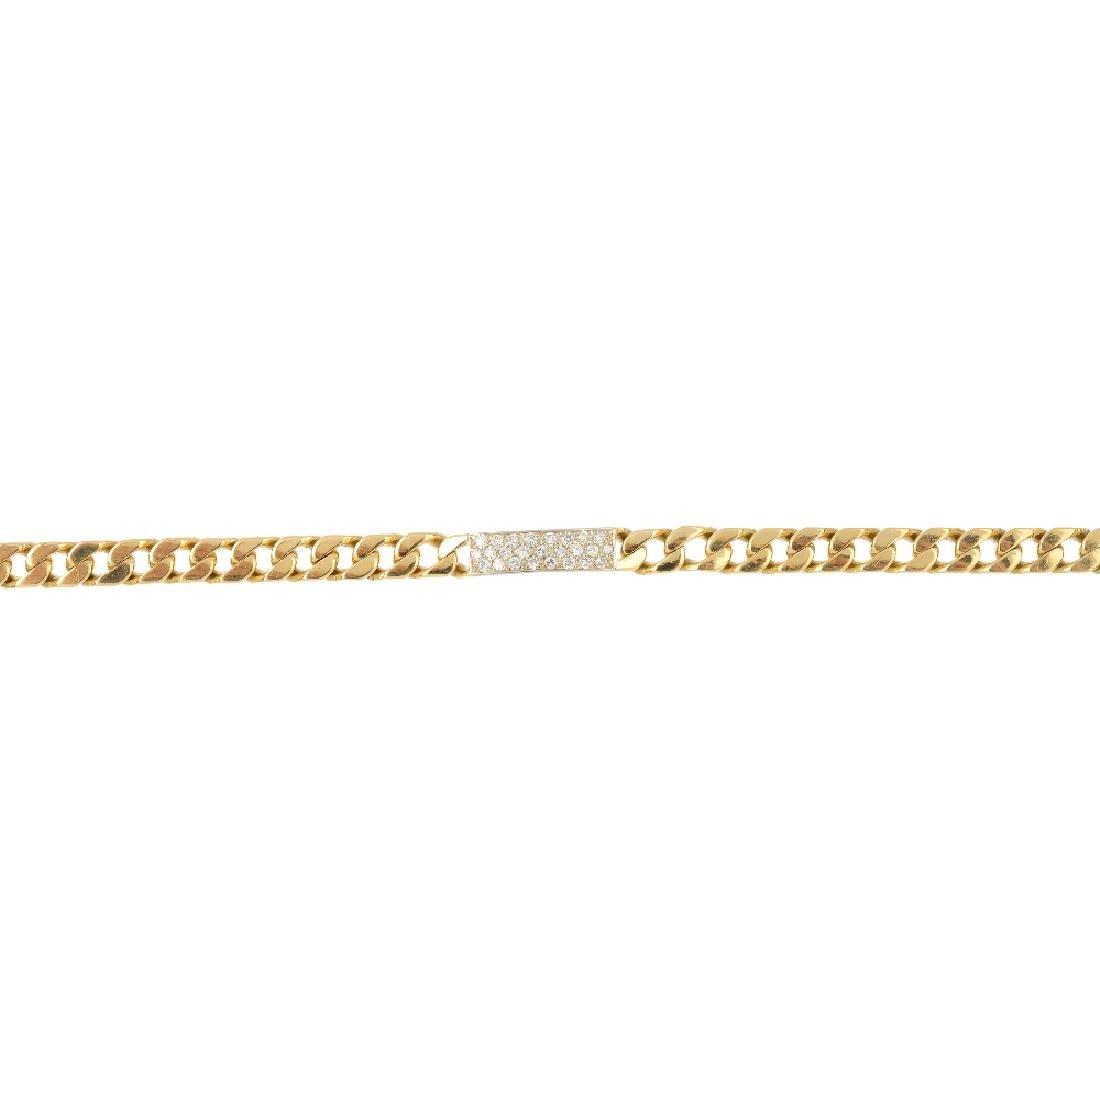 An 18ct gold diamond bracelet. The flat curb-link